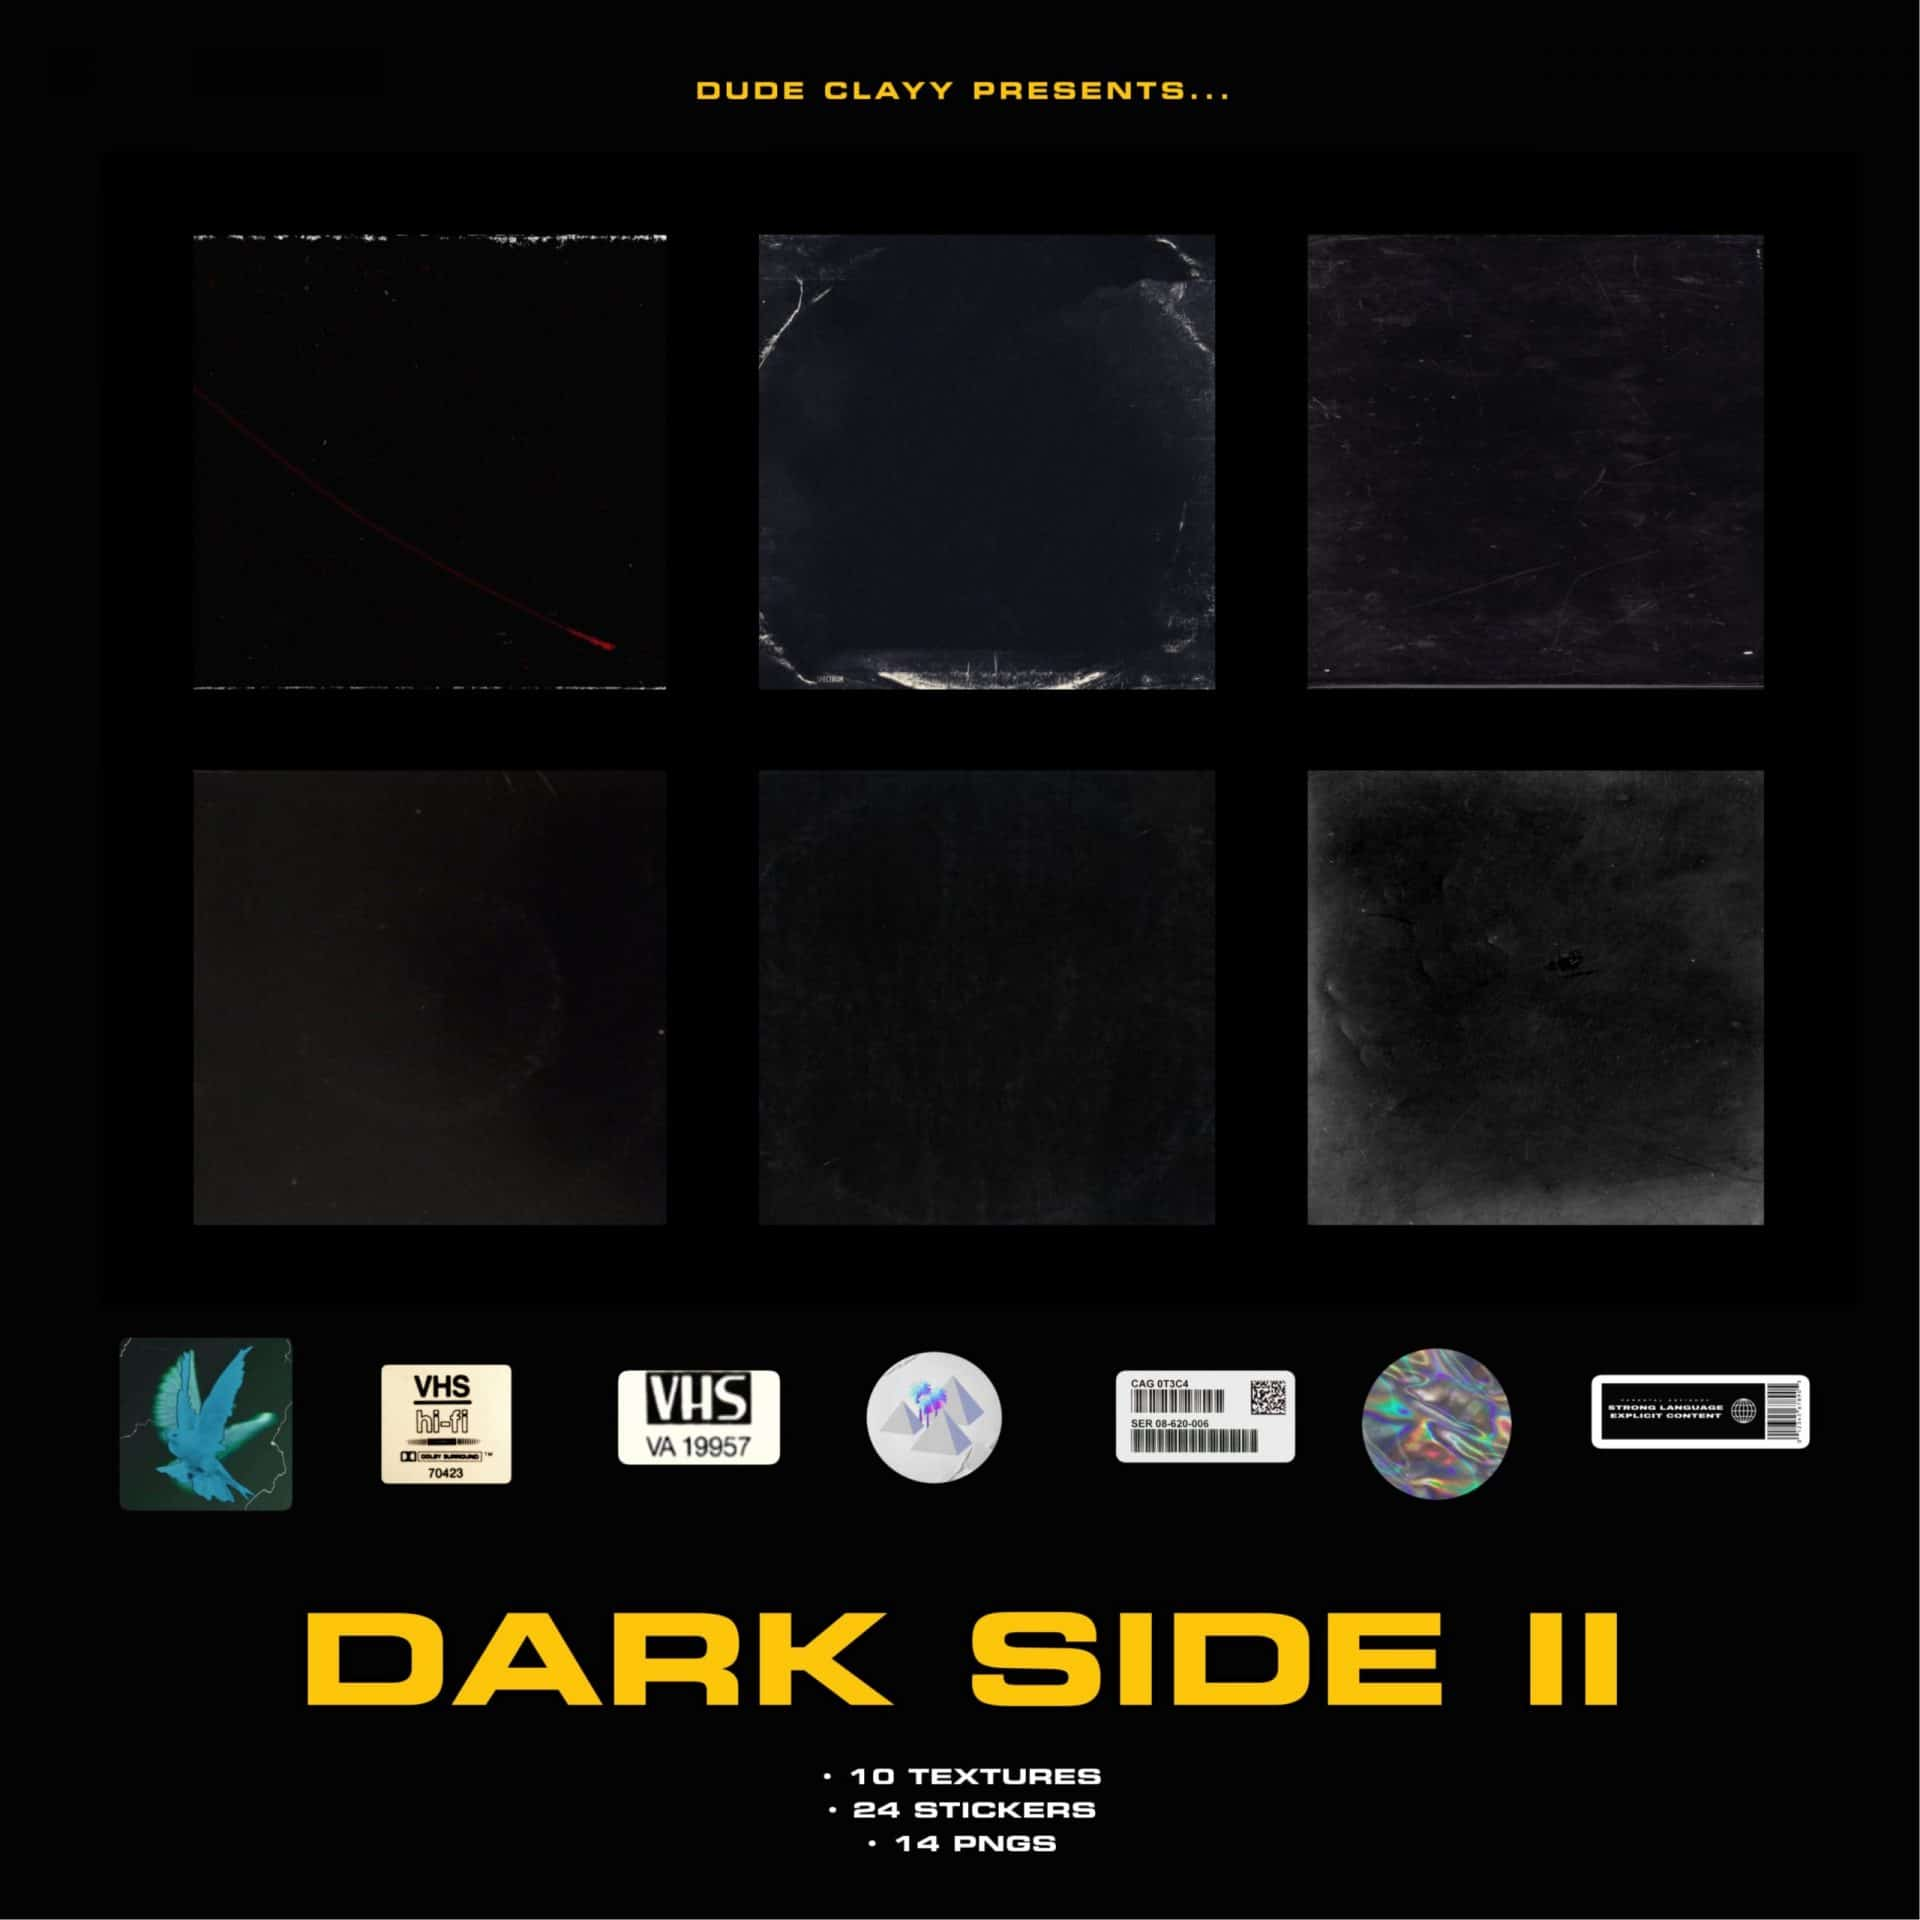 Treesoundrecords-Dude-Clayy-–-Dark-Side-II-Gfx-Pack.jpeg